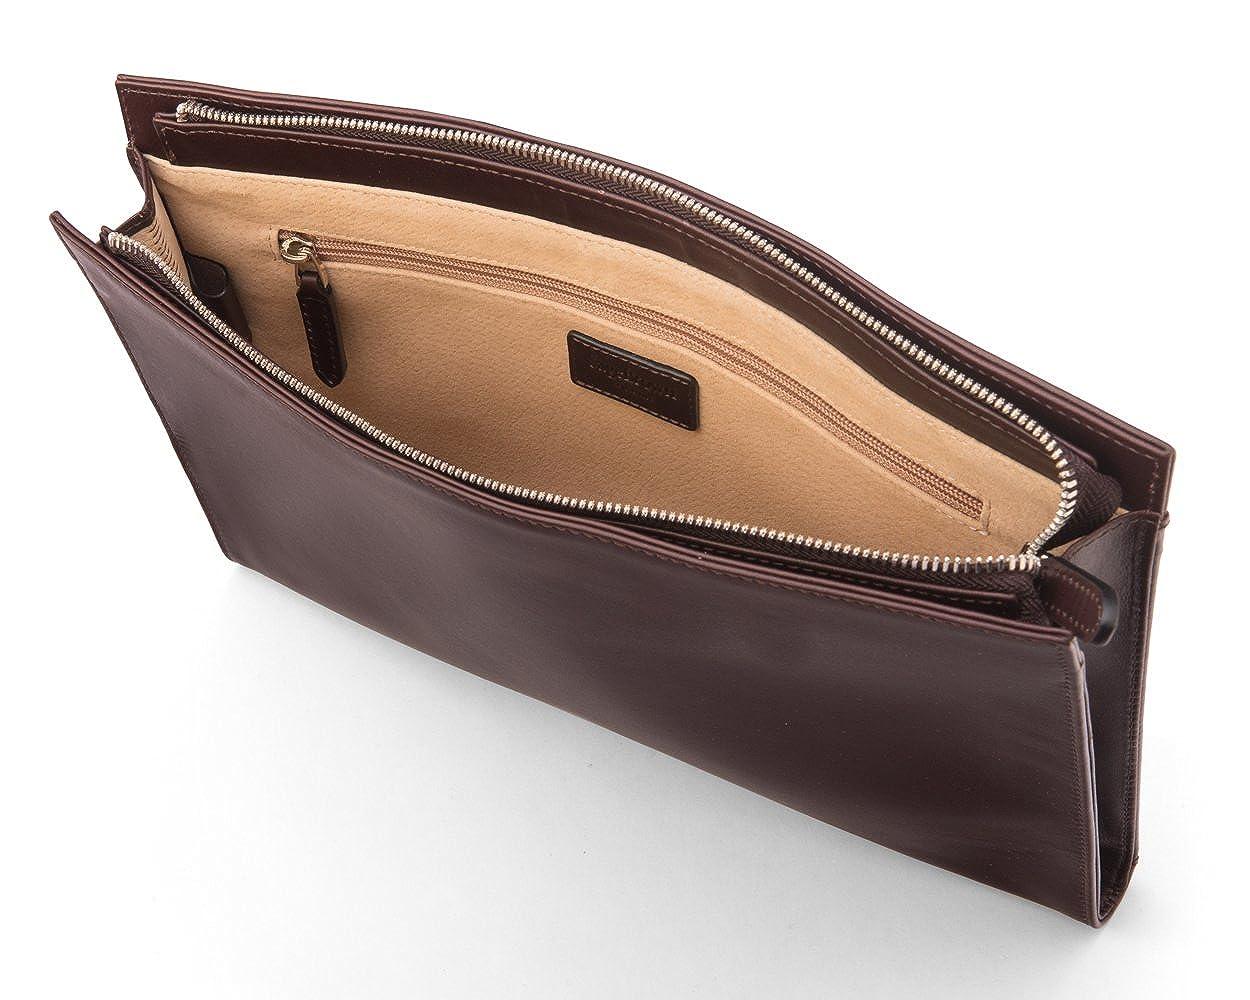 SAGEBROWN Brown Zip Top Leather Folder B078JDZZR2